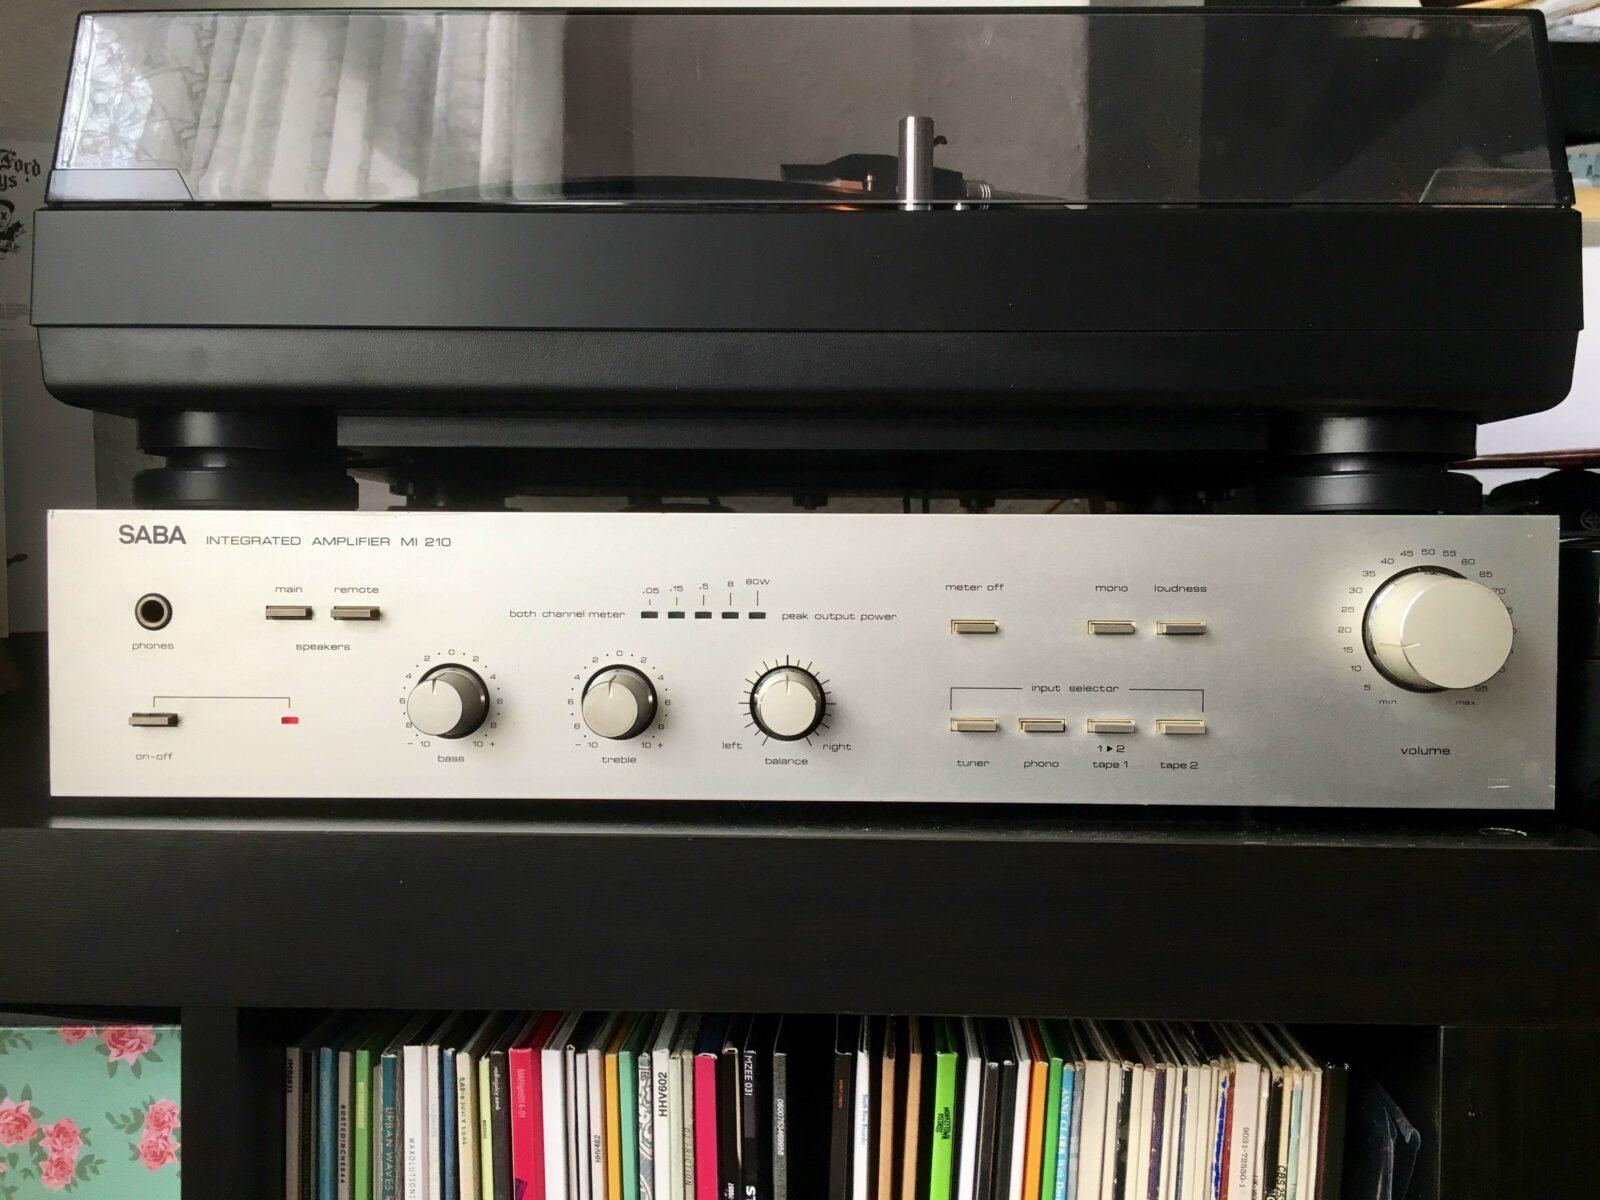 SABA Integrated Amplifier MI 210